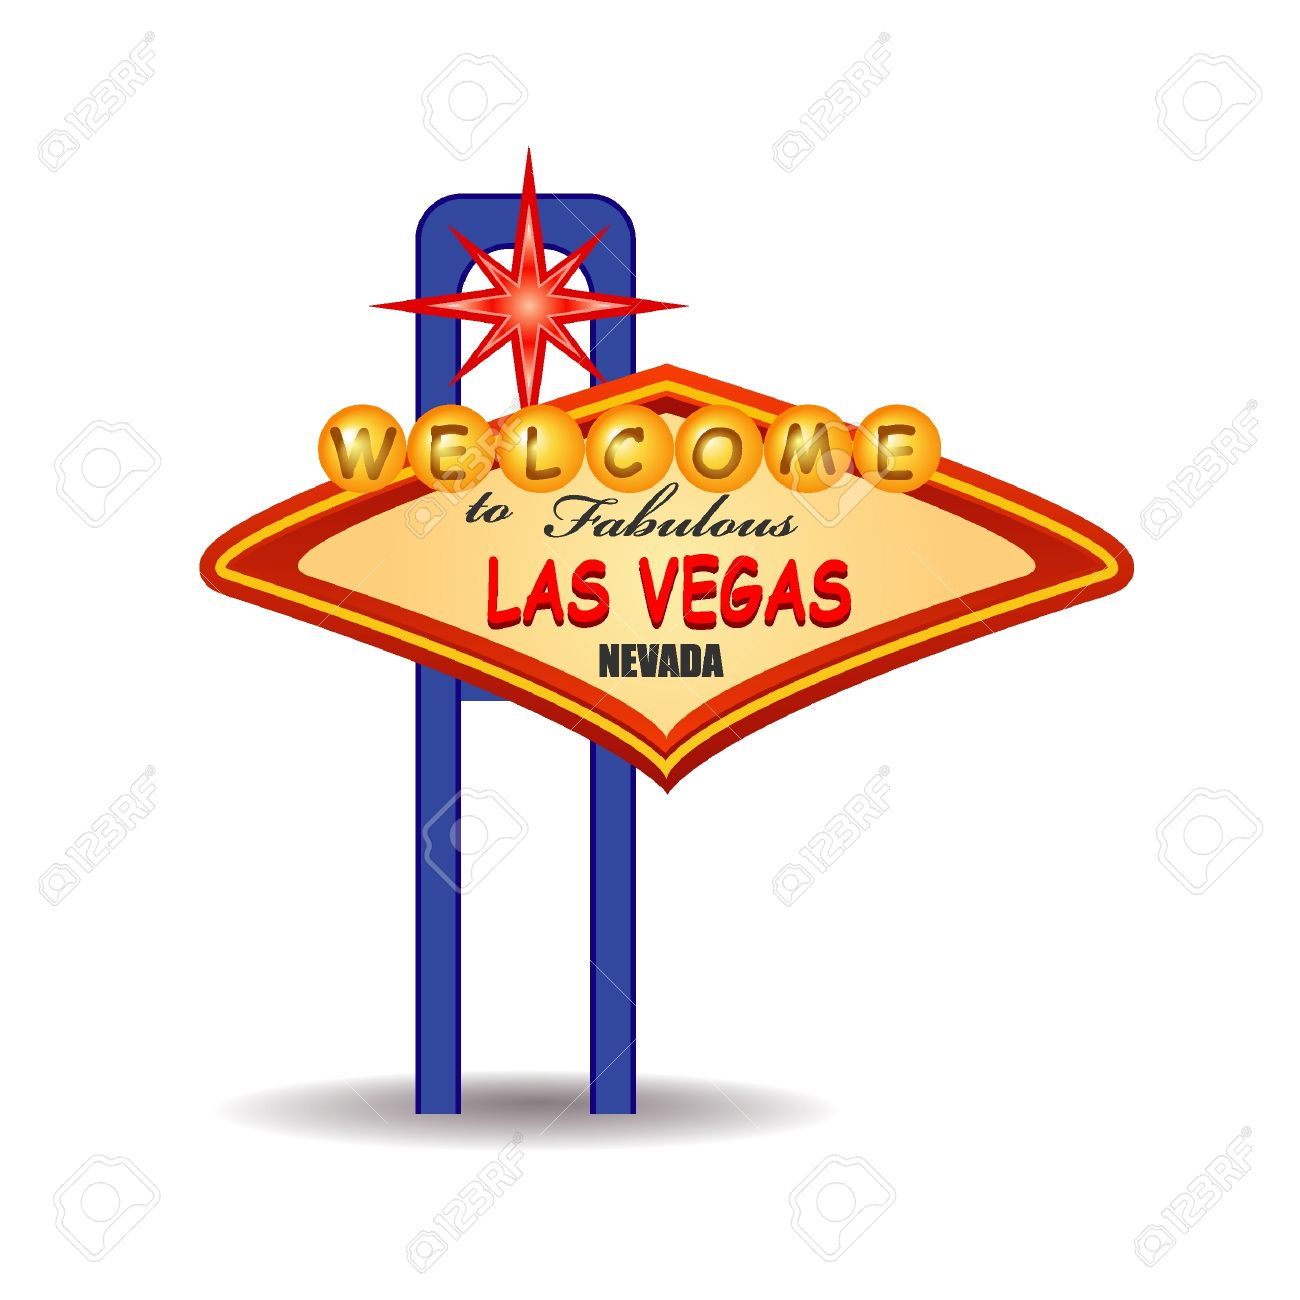 5,146 Las Vegas Cliparts, Stock Vector And Royalty Free Las Vegas ...